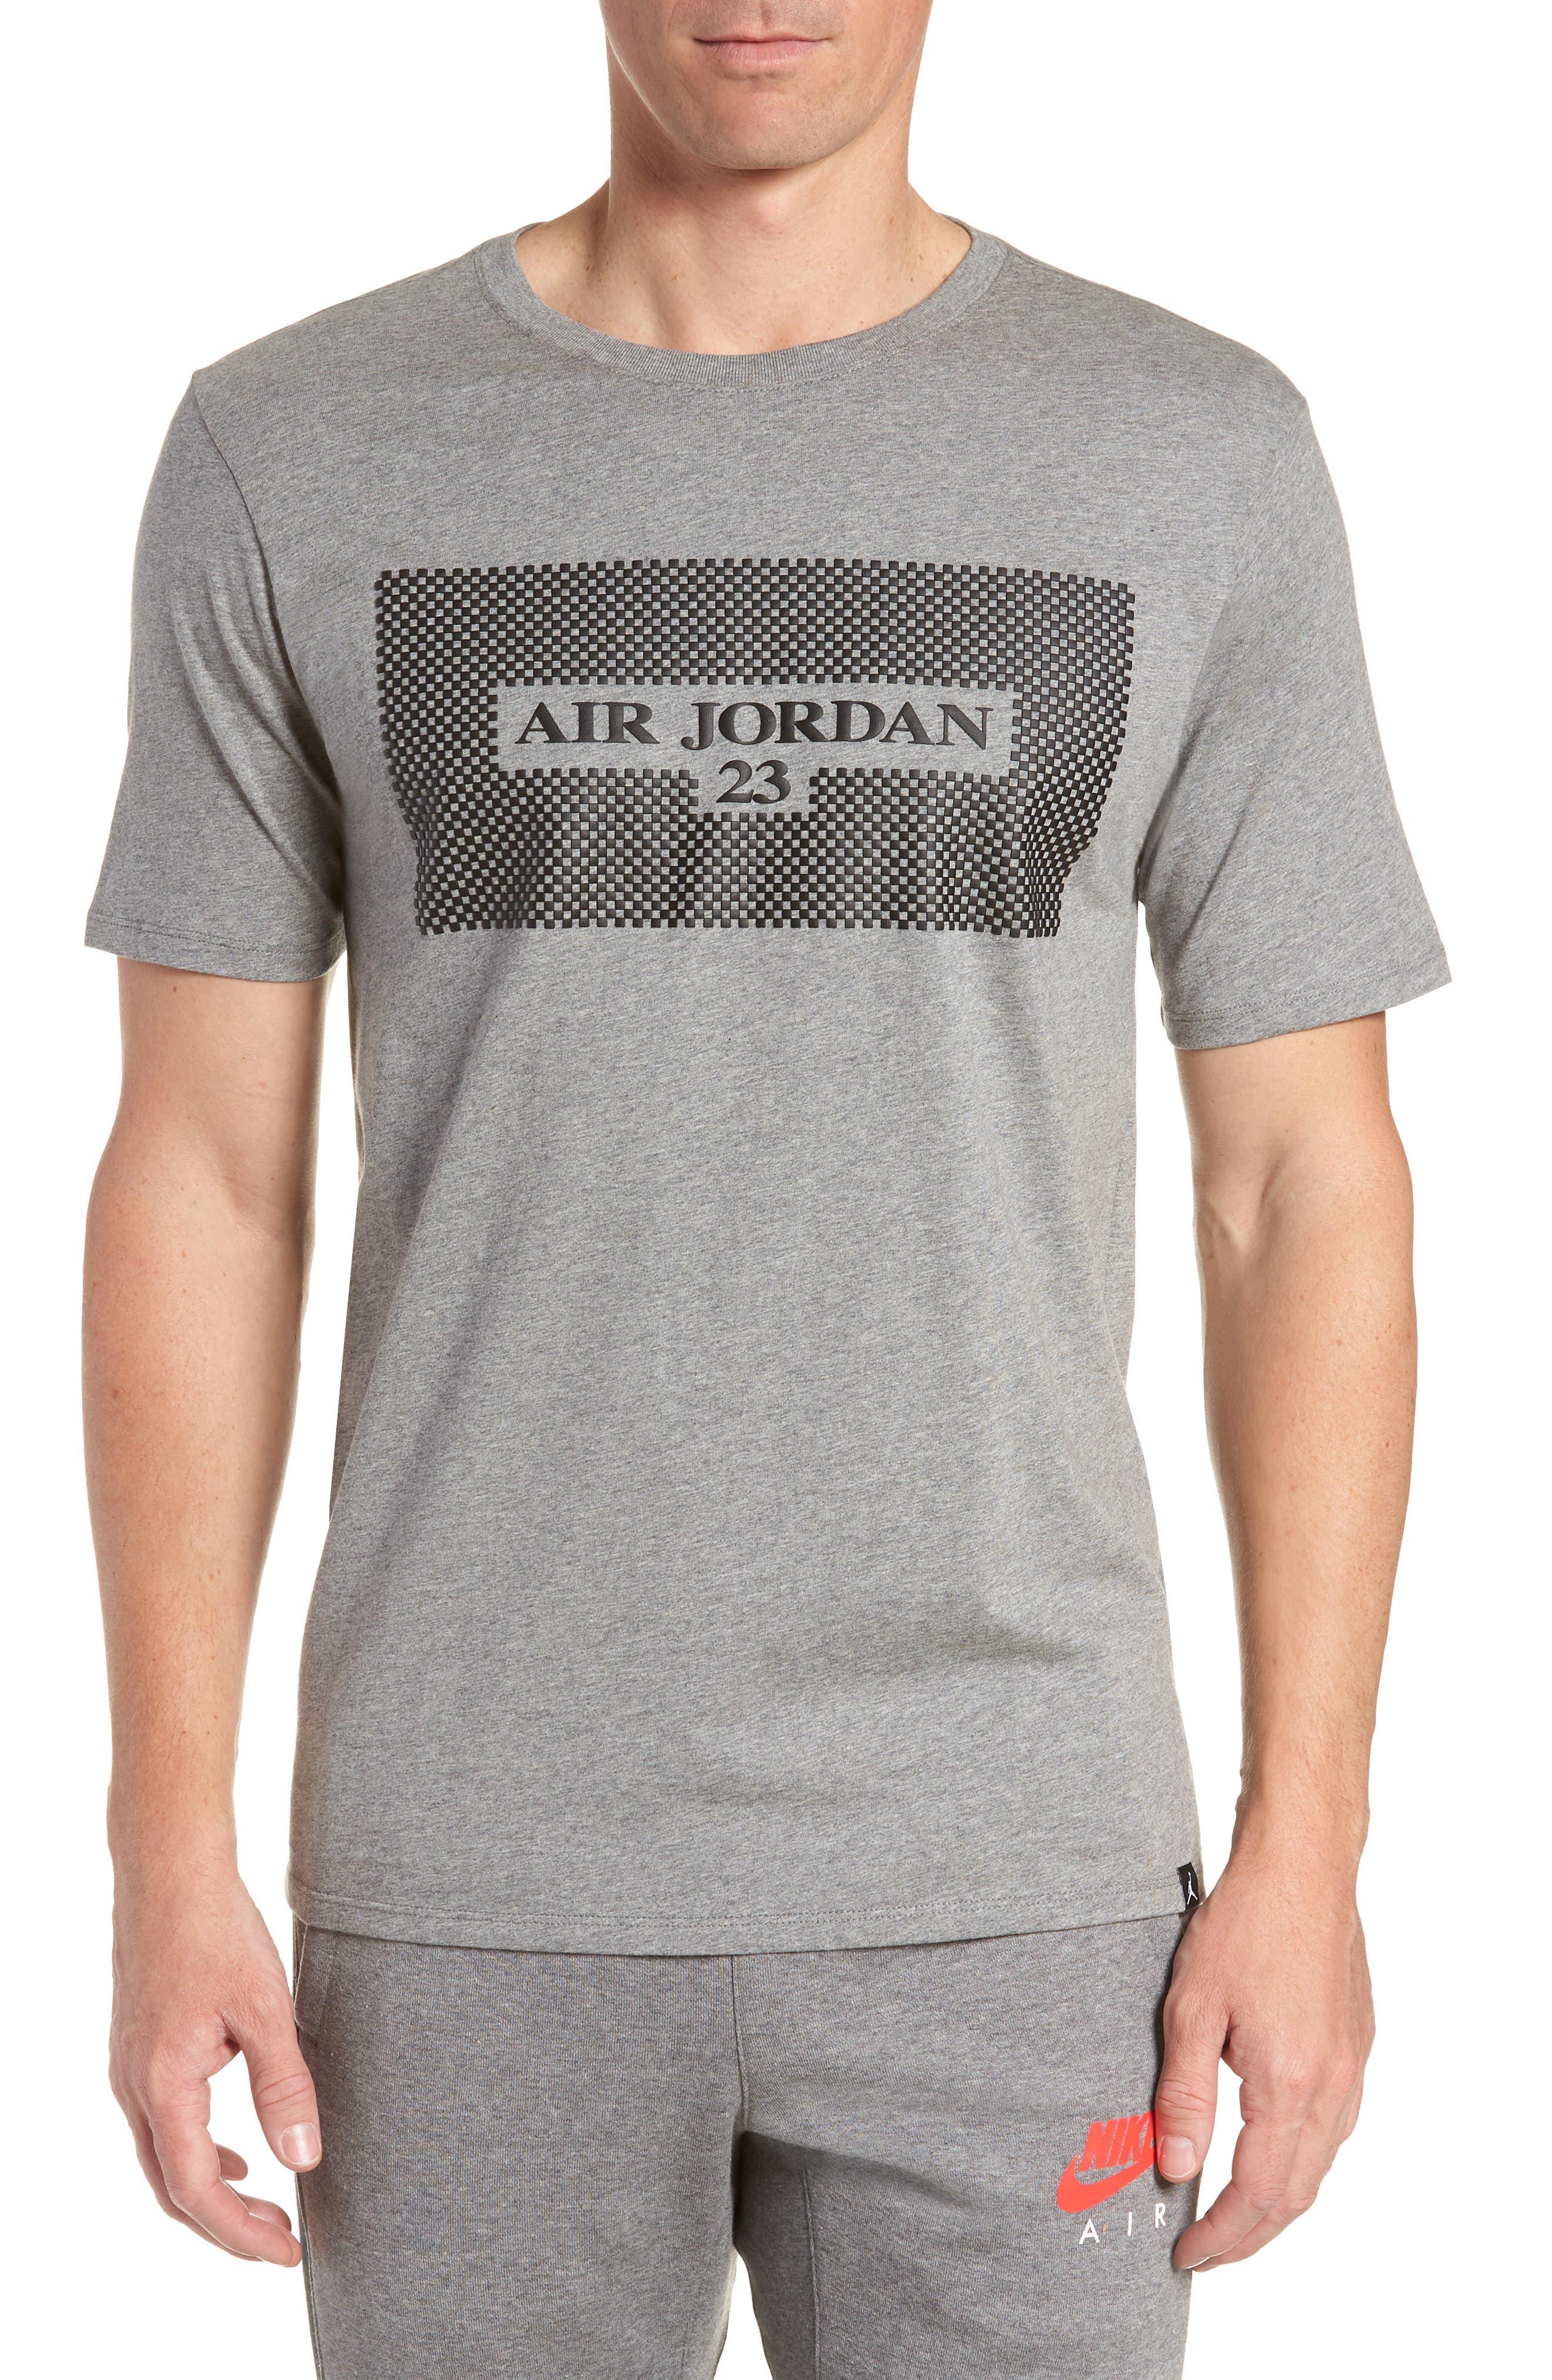 Air Jordan 23 T-Shirt,                             Main thumbnail 1, color,                             CARBON HEATHER/ BLACK